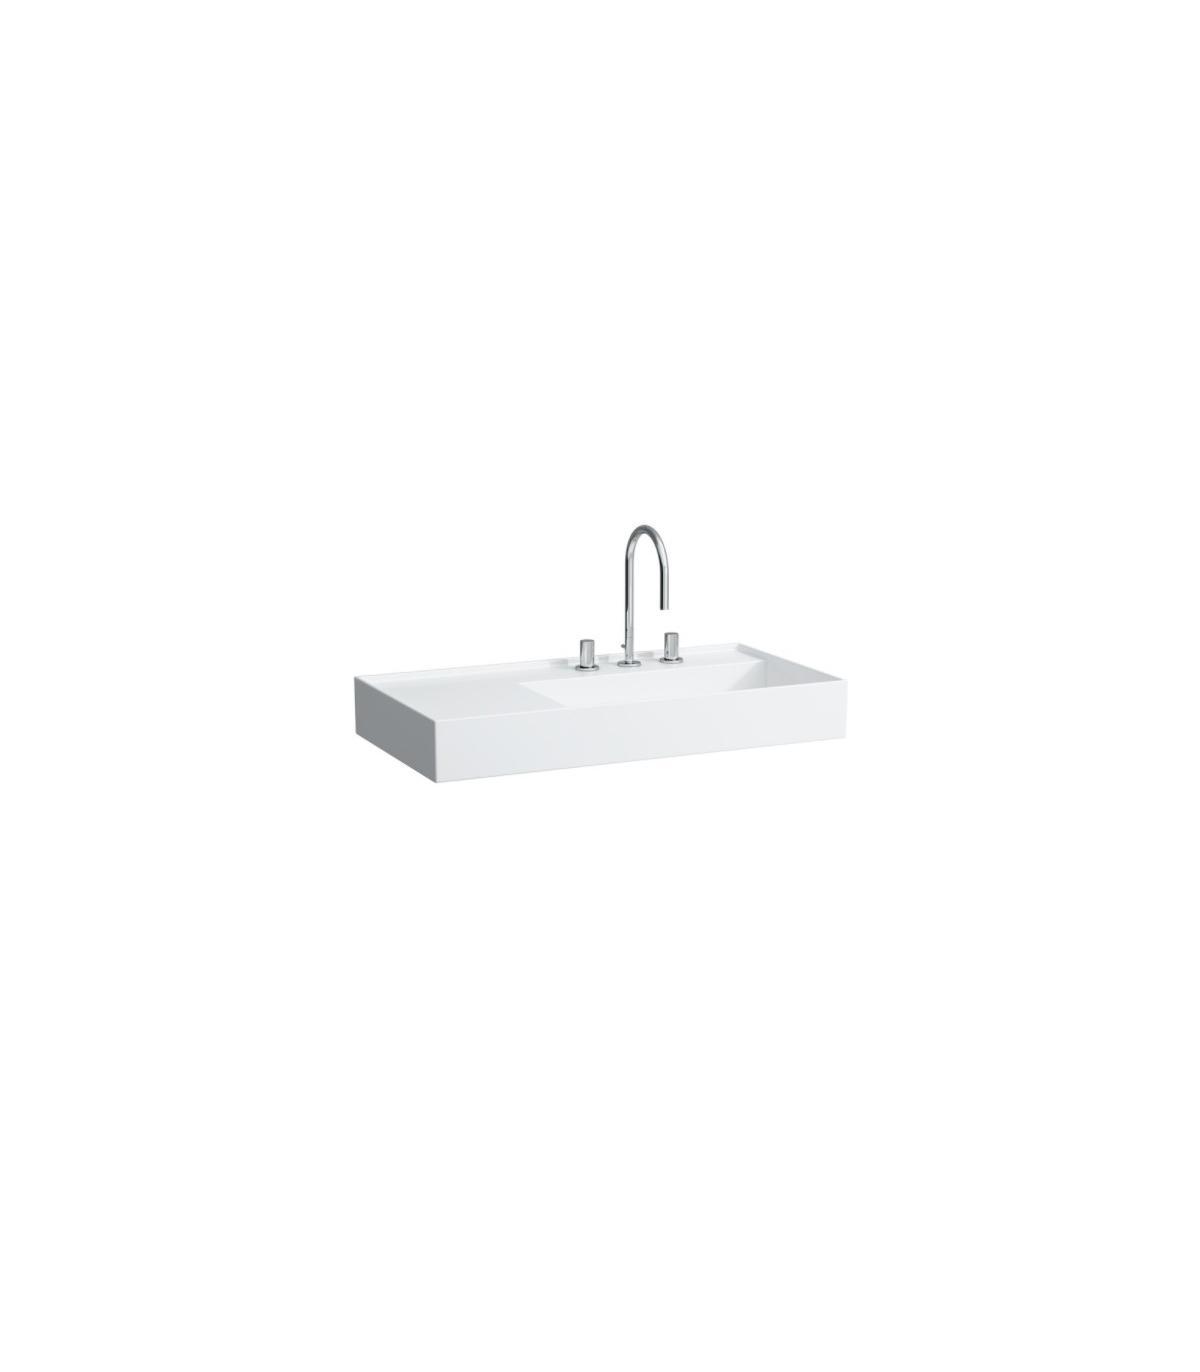 Ideal Standard Tonic 2 : miscelatore lavabo con scarico ideal standard tonic 2 a6326aa cromo ~ Watch28wear.com Haus und Dekorationen